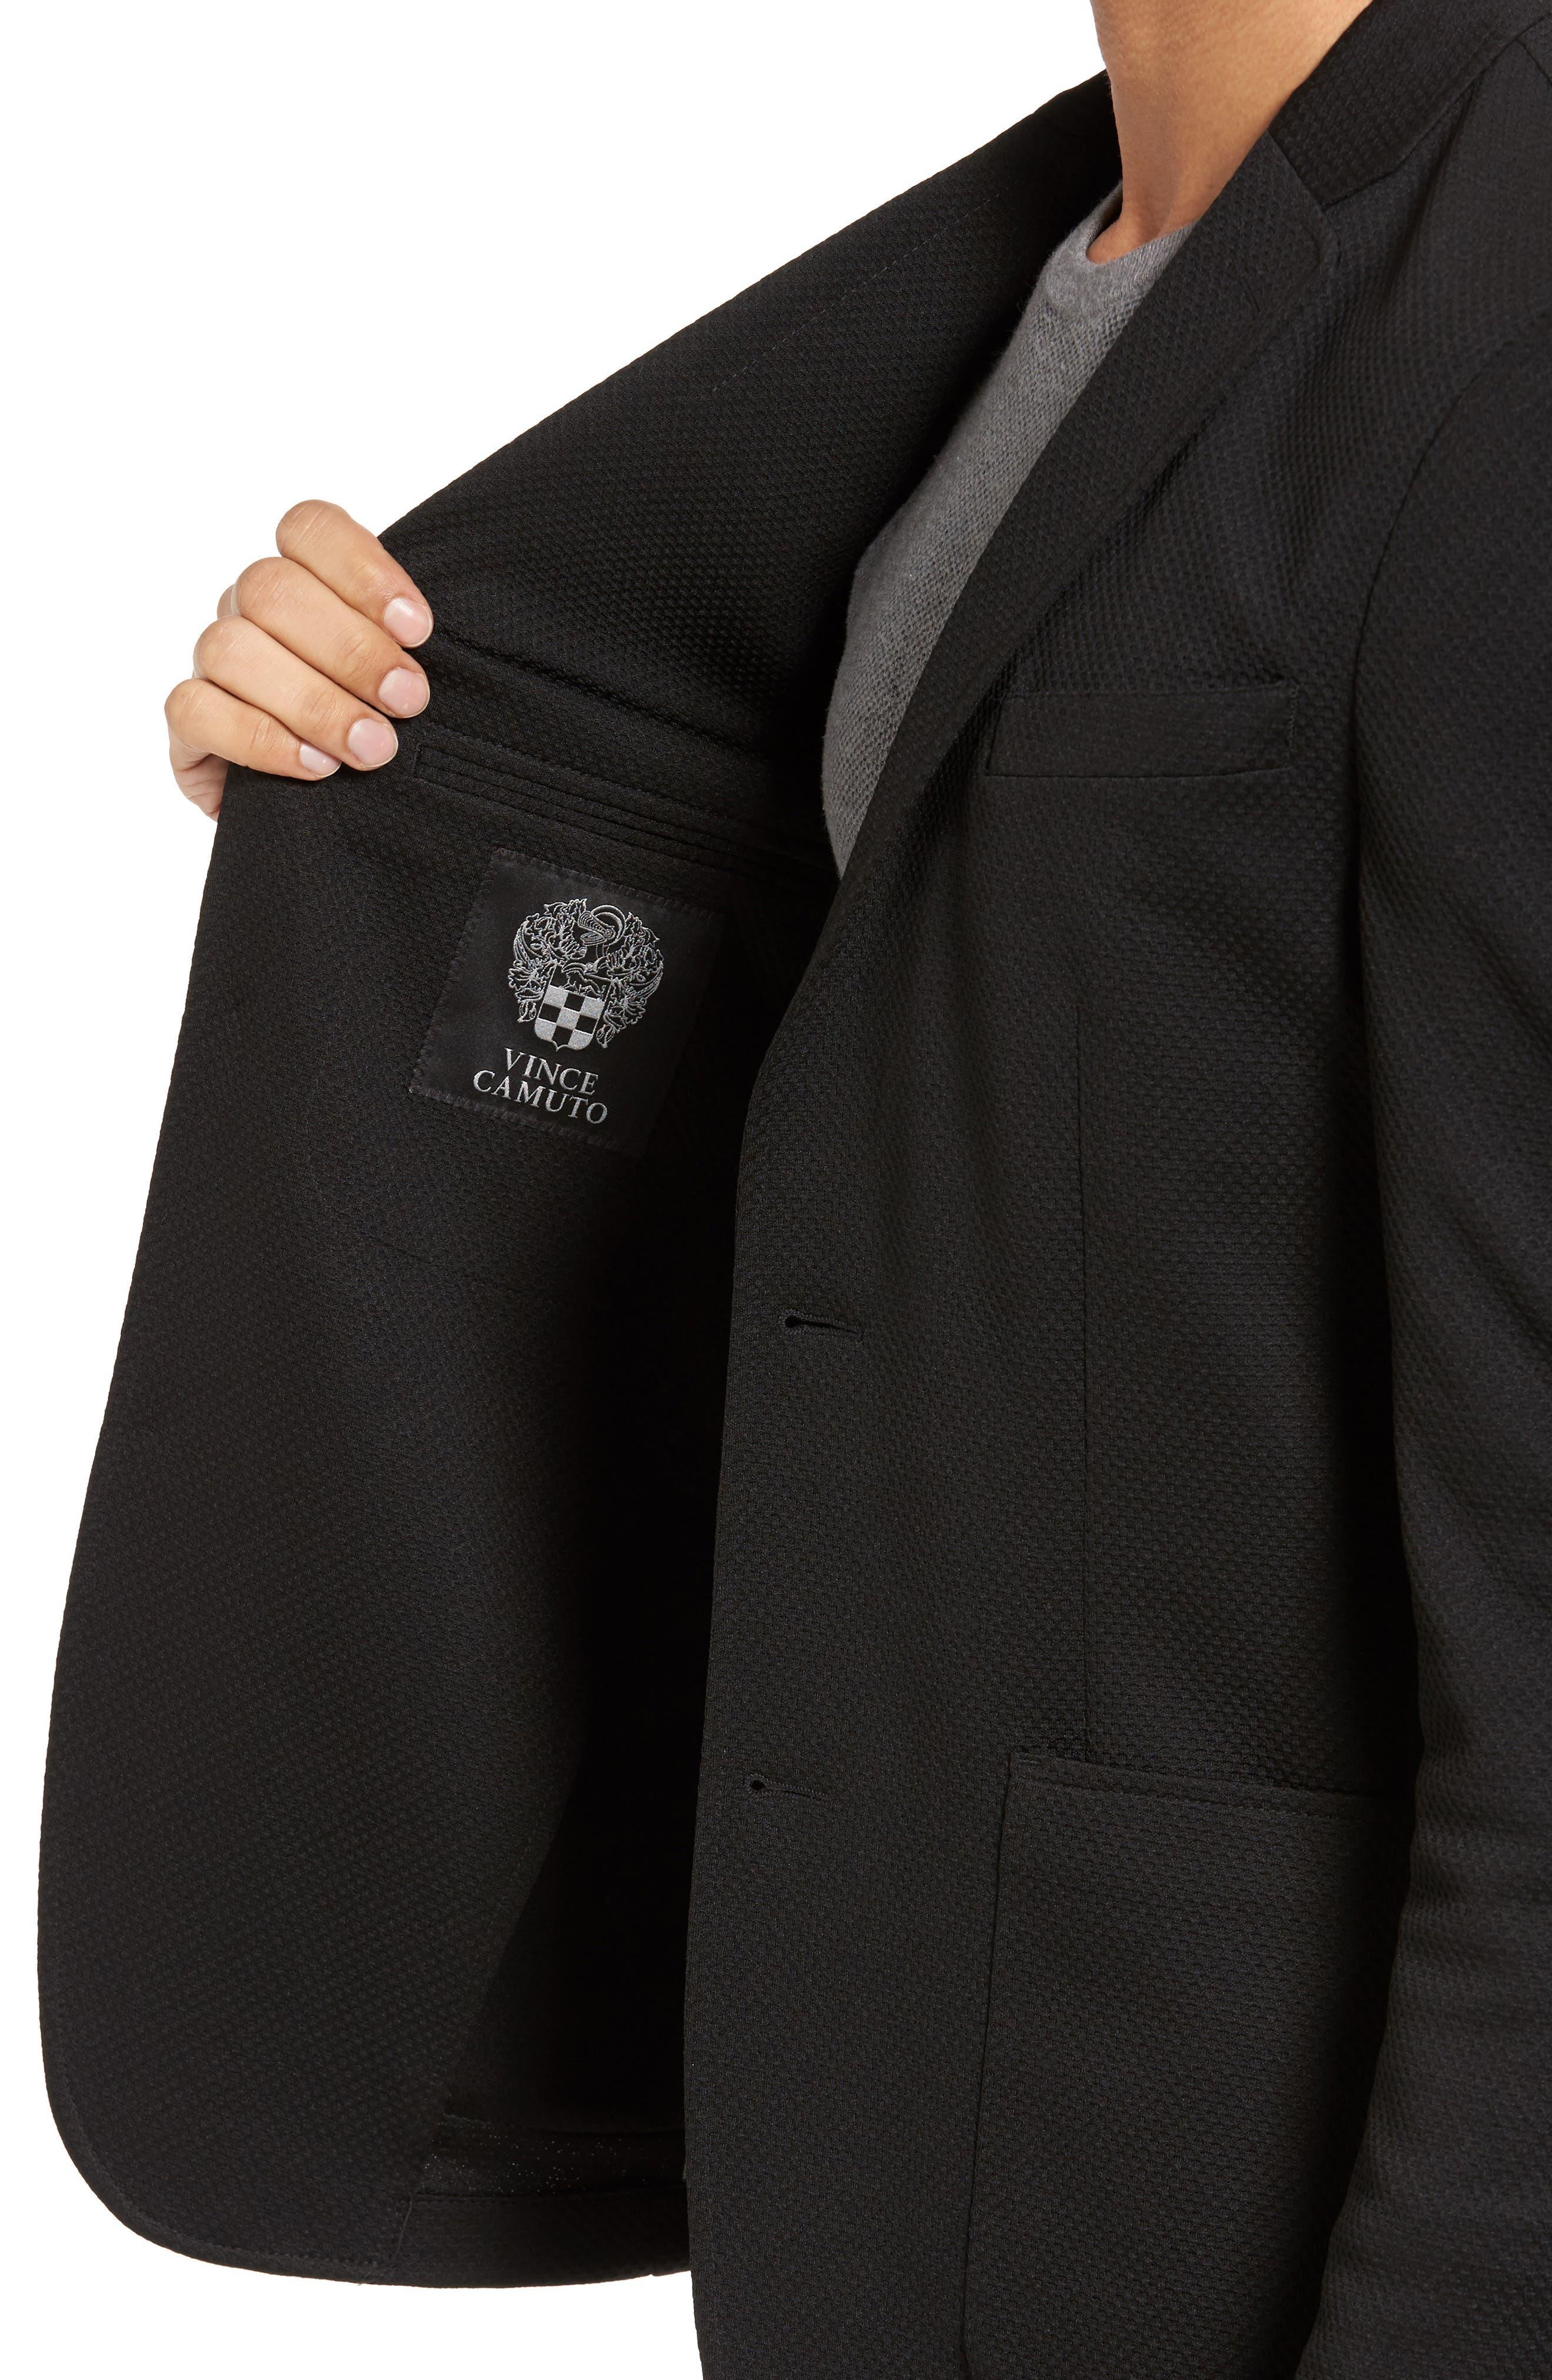 VINCE CAMUTO, Slim Fit Stretch Knit Sport Coat, Alternate thumbnail 5, color, BLACK